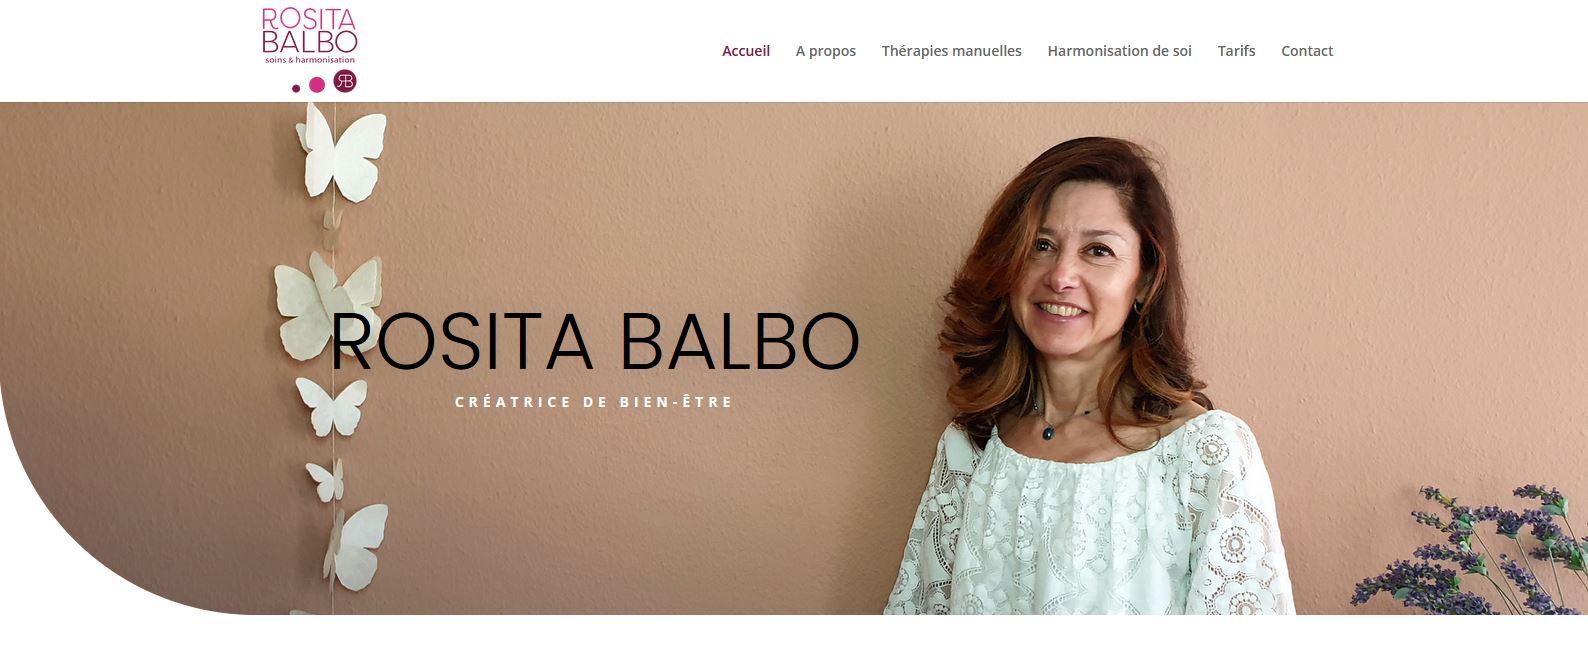 Santé - Rosita Balbo - Site internet - Home Page